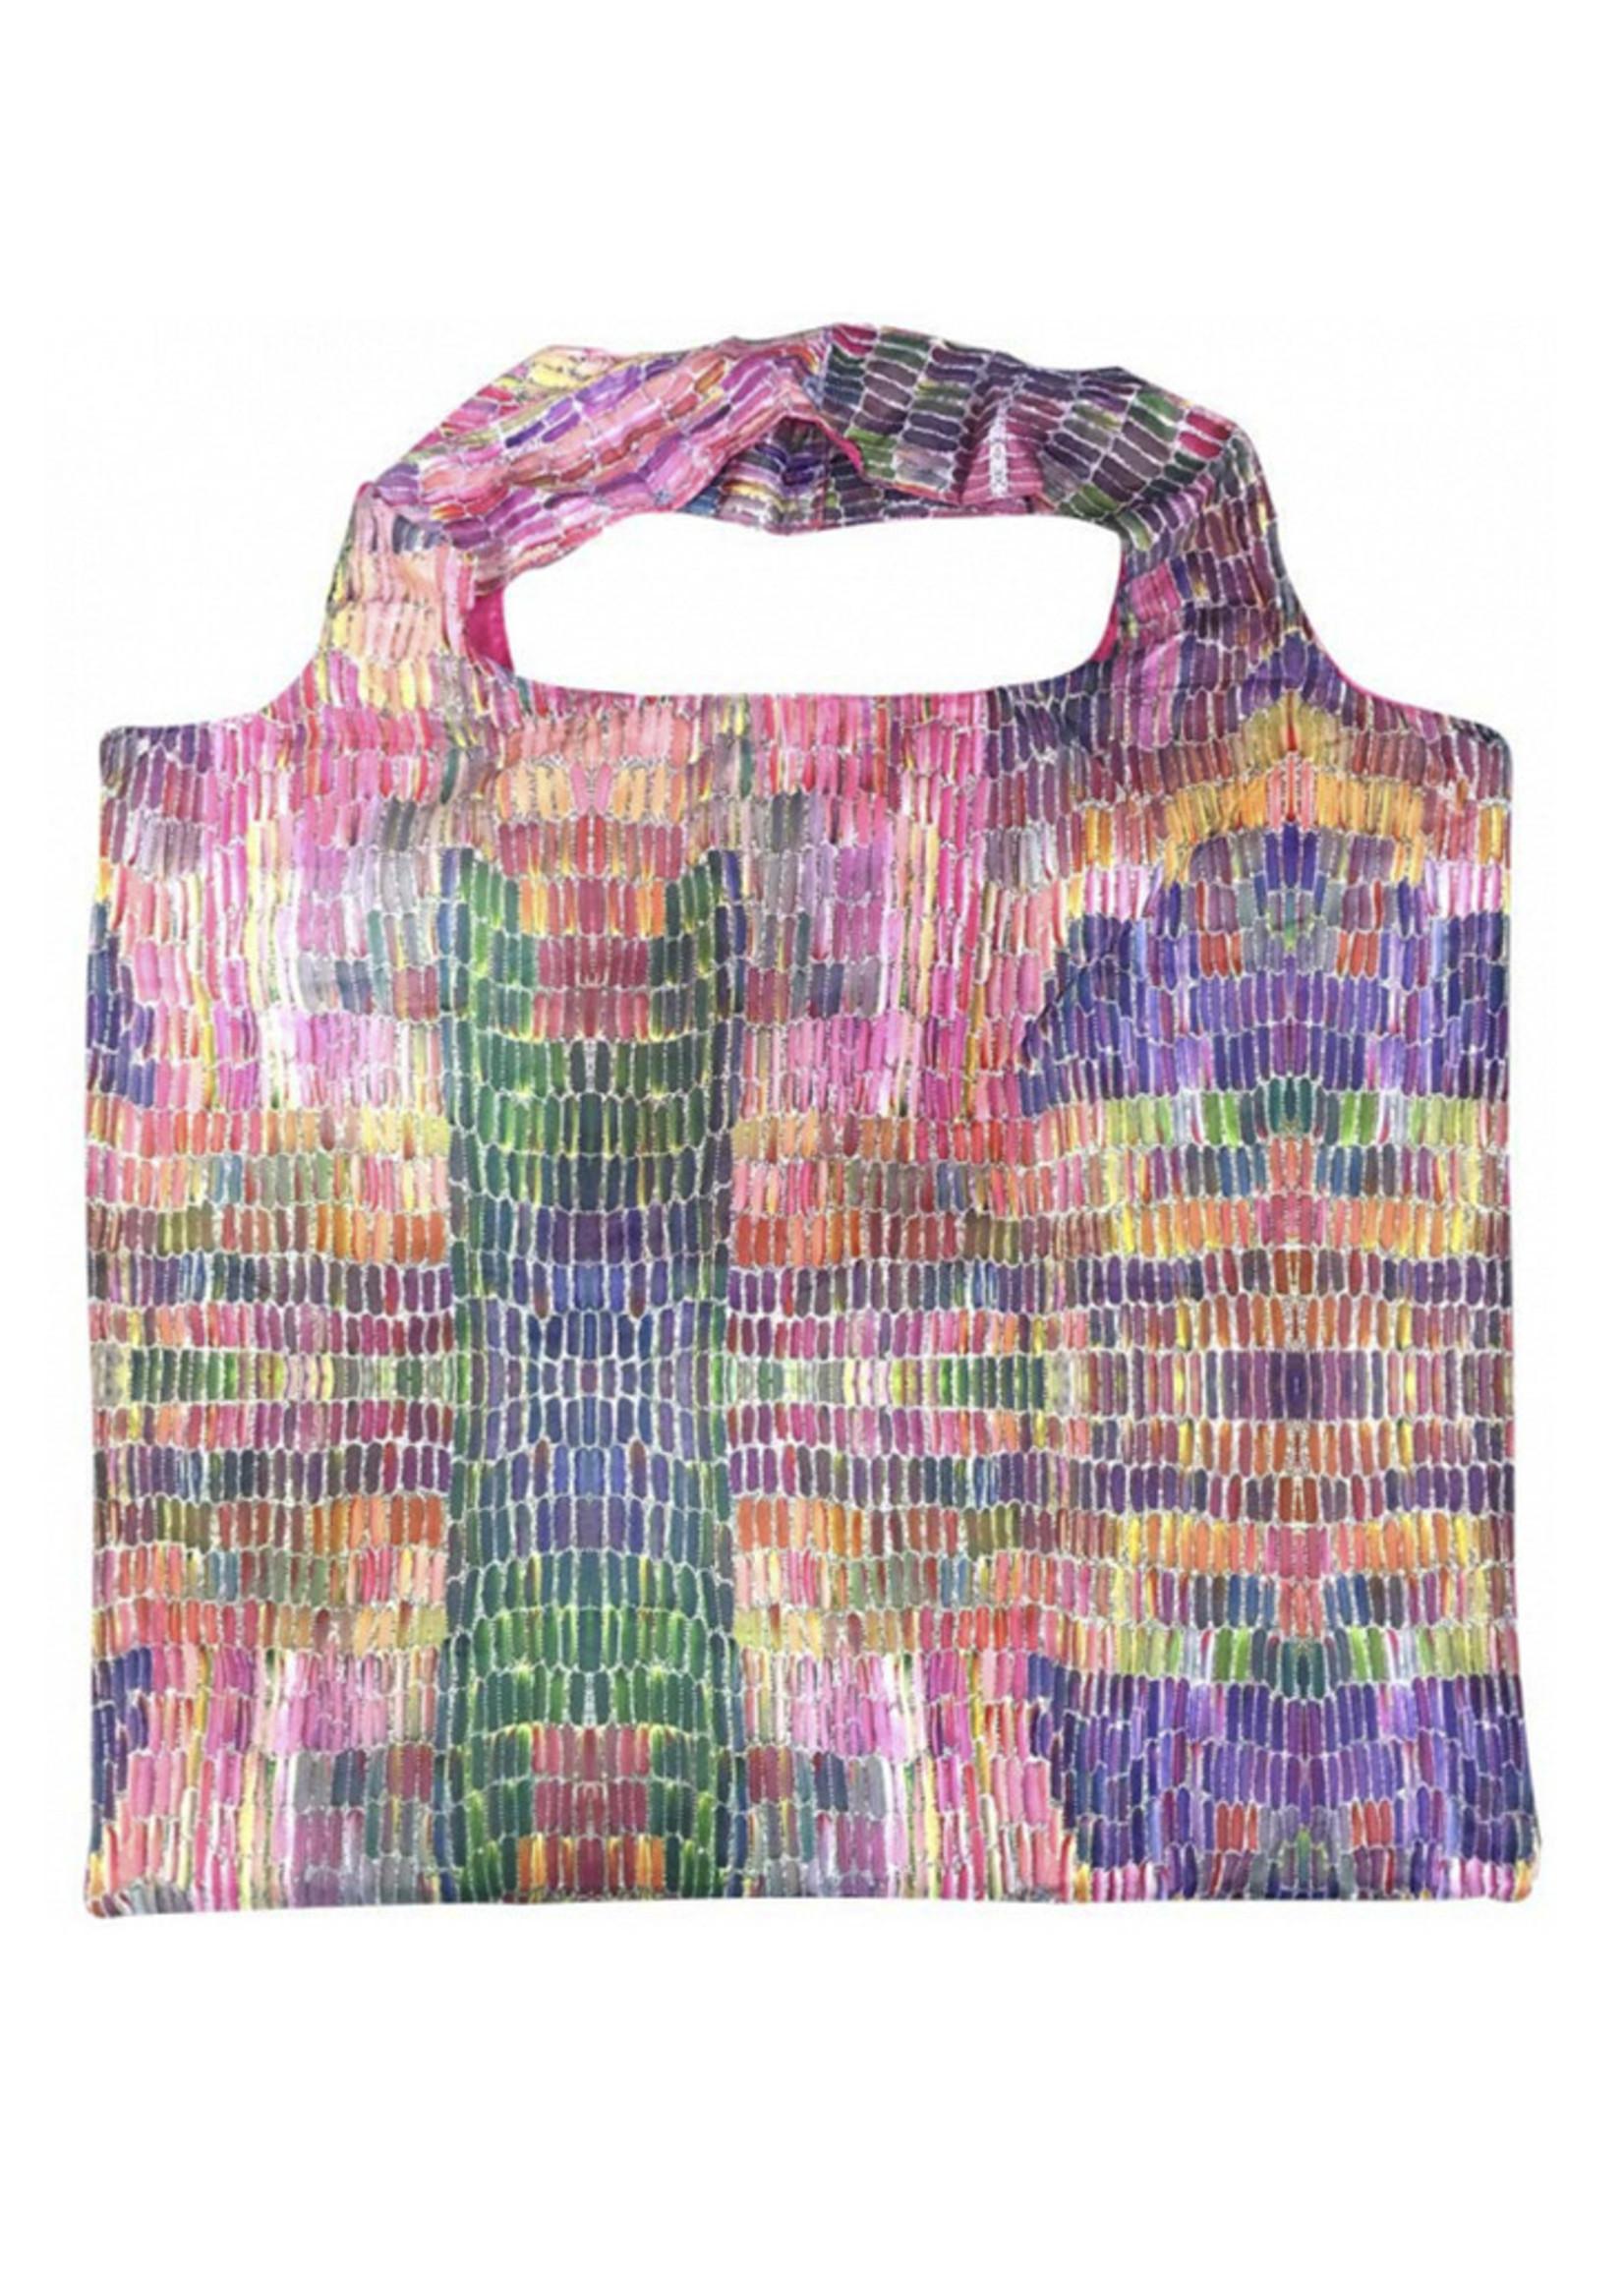 Utopia Foldable Shopping Bag - Jeannie Mills